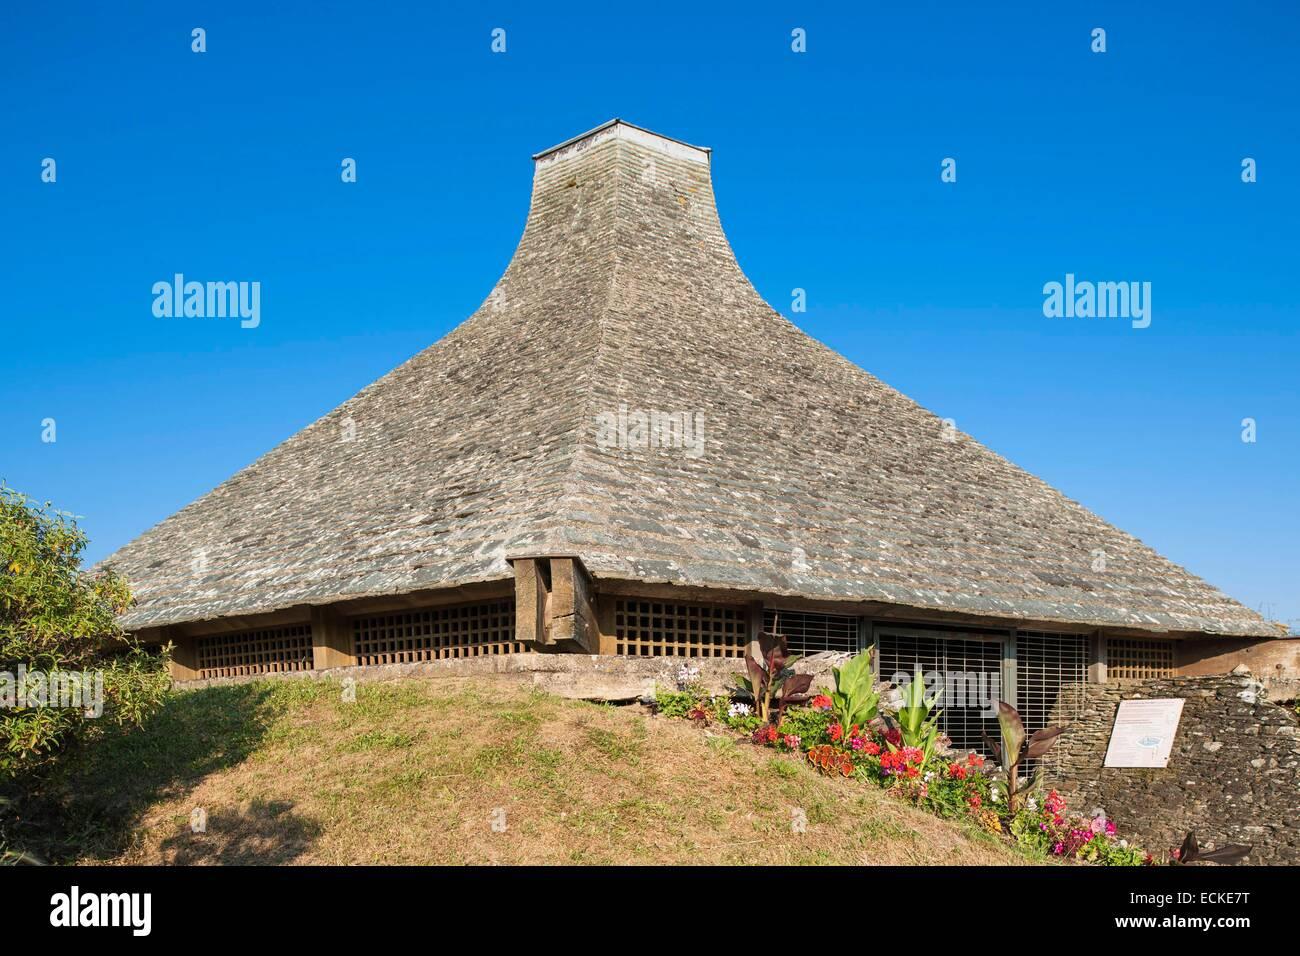 France, Manche, Cotentin, Portbail, hexagonal Baptistery, vestige of the Gallo Roman era - Stock Image